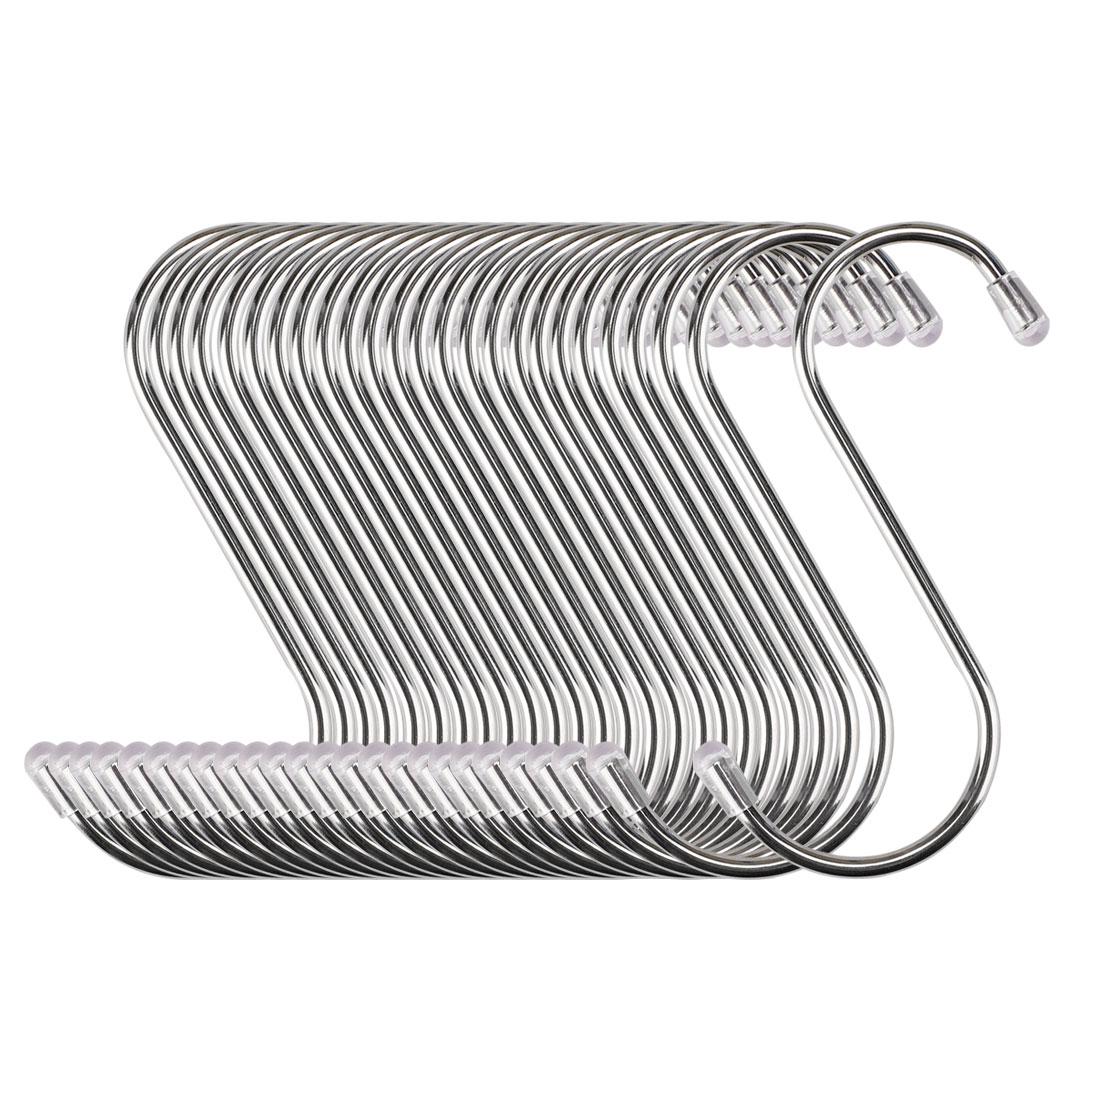 S Shape Hook Rack Stainless Steel for Kitchenware Clothes Utensil Holder 25 Pack